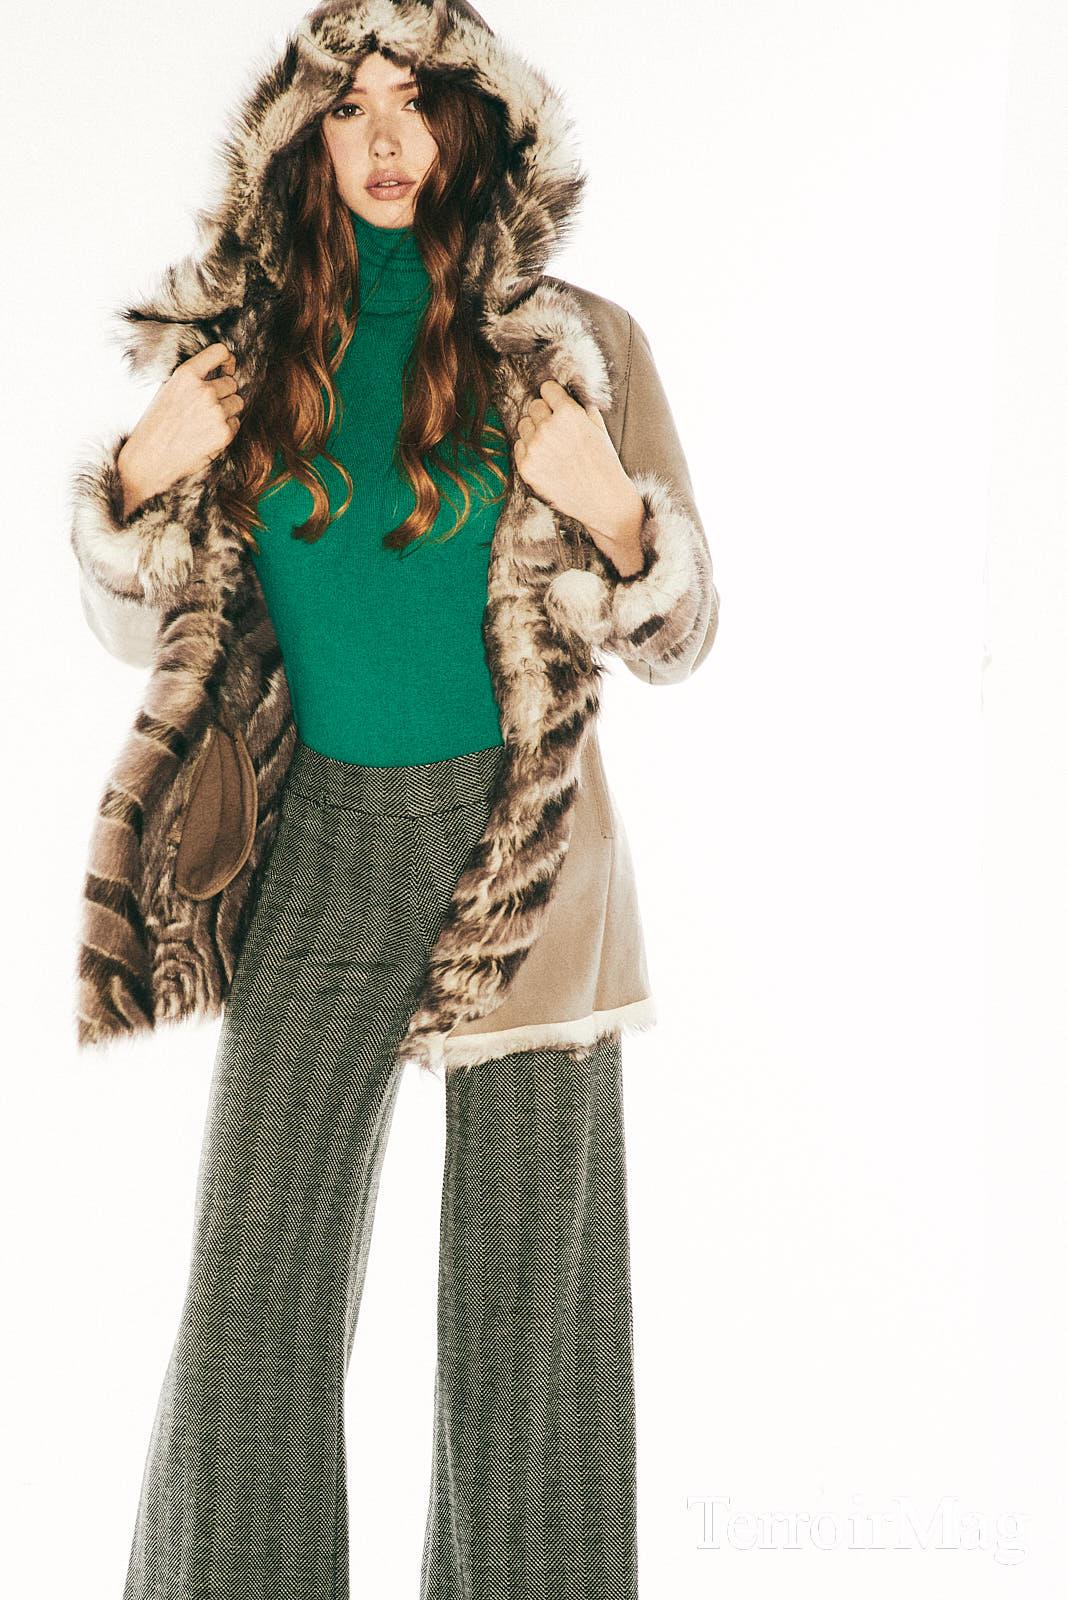 Furry Jacket - Vintage Pants - Casta Blanca Shoes - Nine West Turtle Neck - Zara Bag - Custome Made  Hat - Joe Fresh